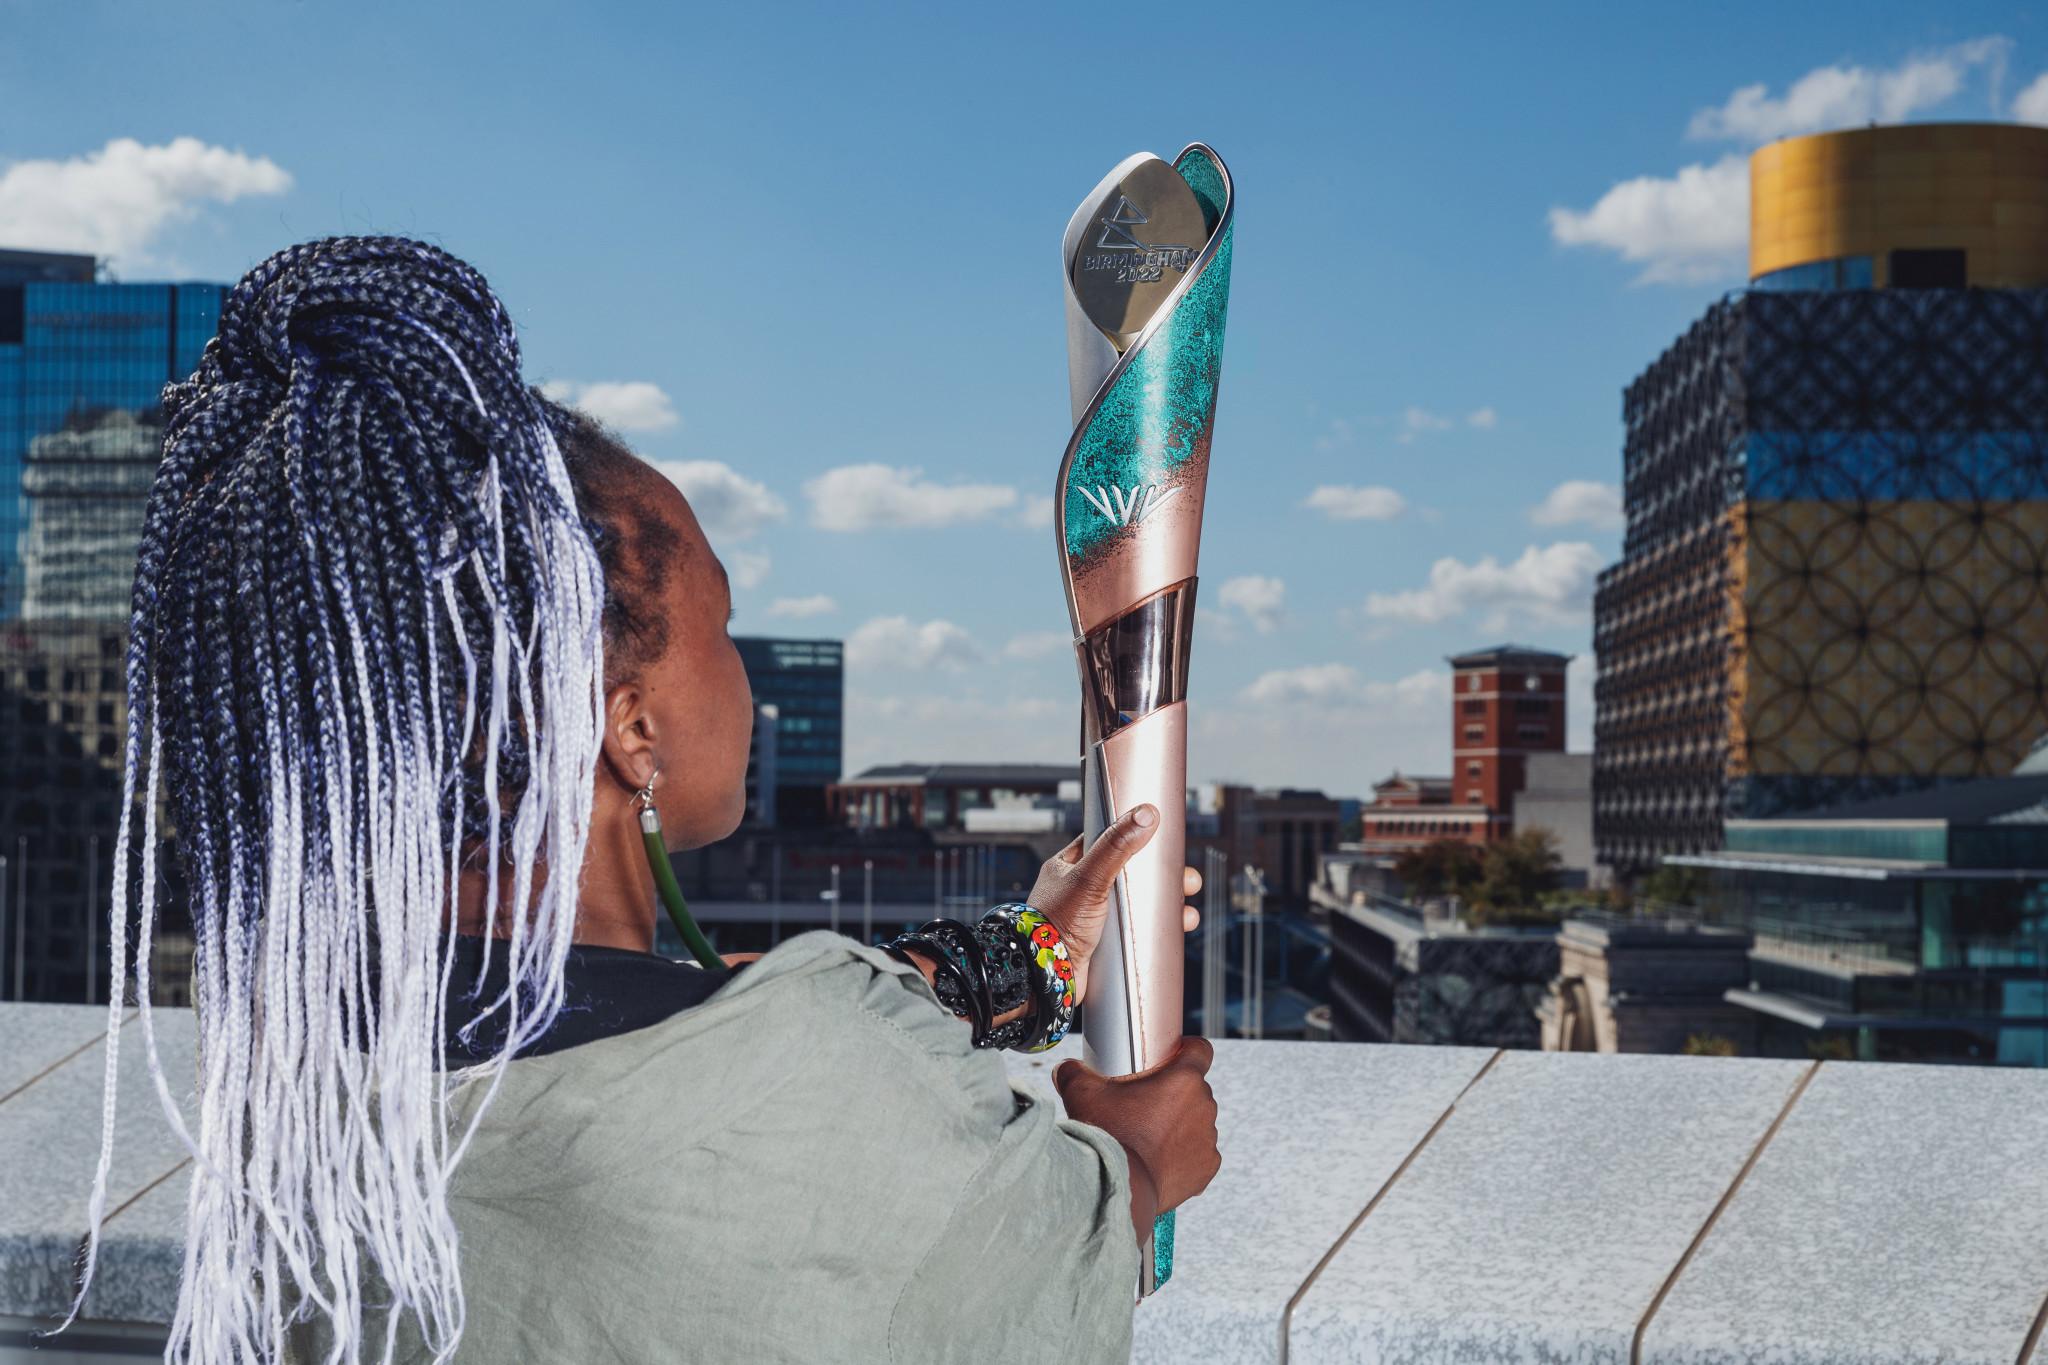 Laura Nyahuye designed the Birmingham 2022 Baton ©Birmingham 2022